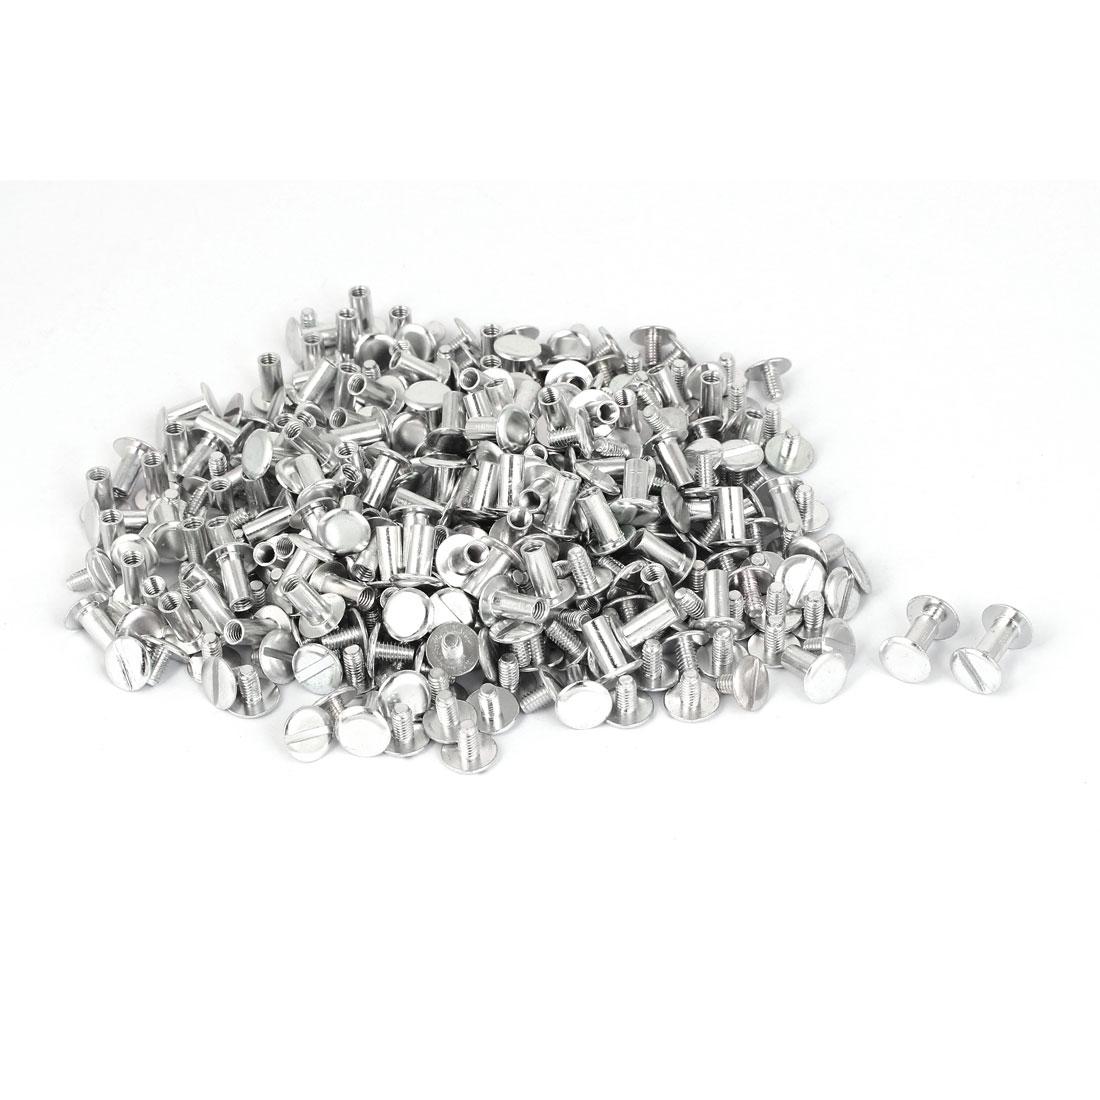 M5x10mm-Aluminum-Chicago-Screws-Binding-Posts-Silver-Tone-200pcs